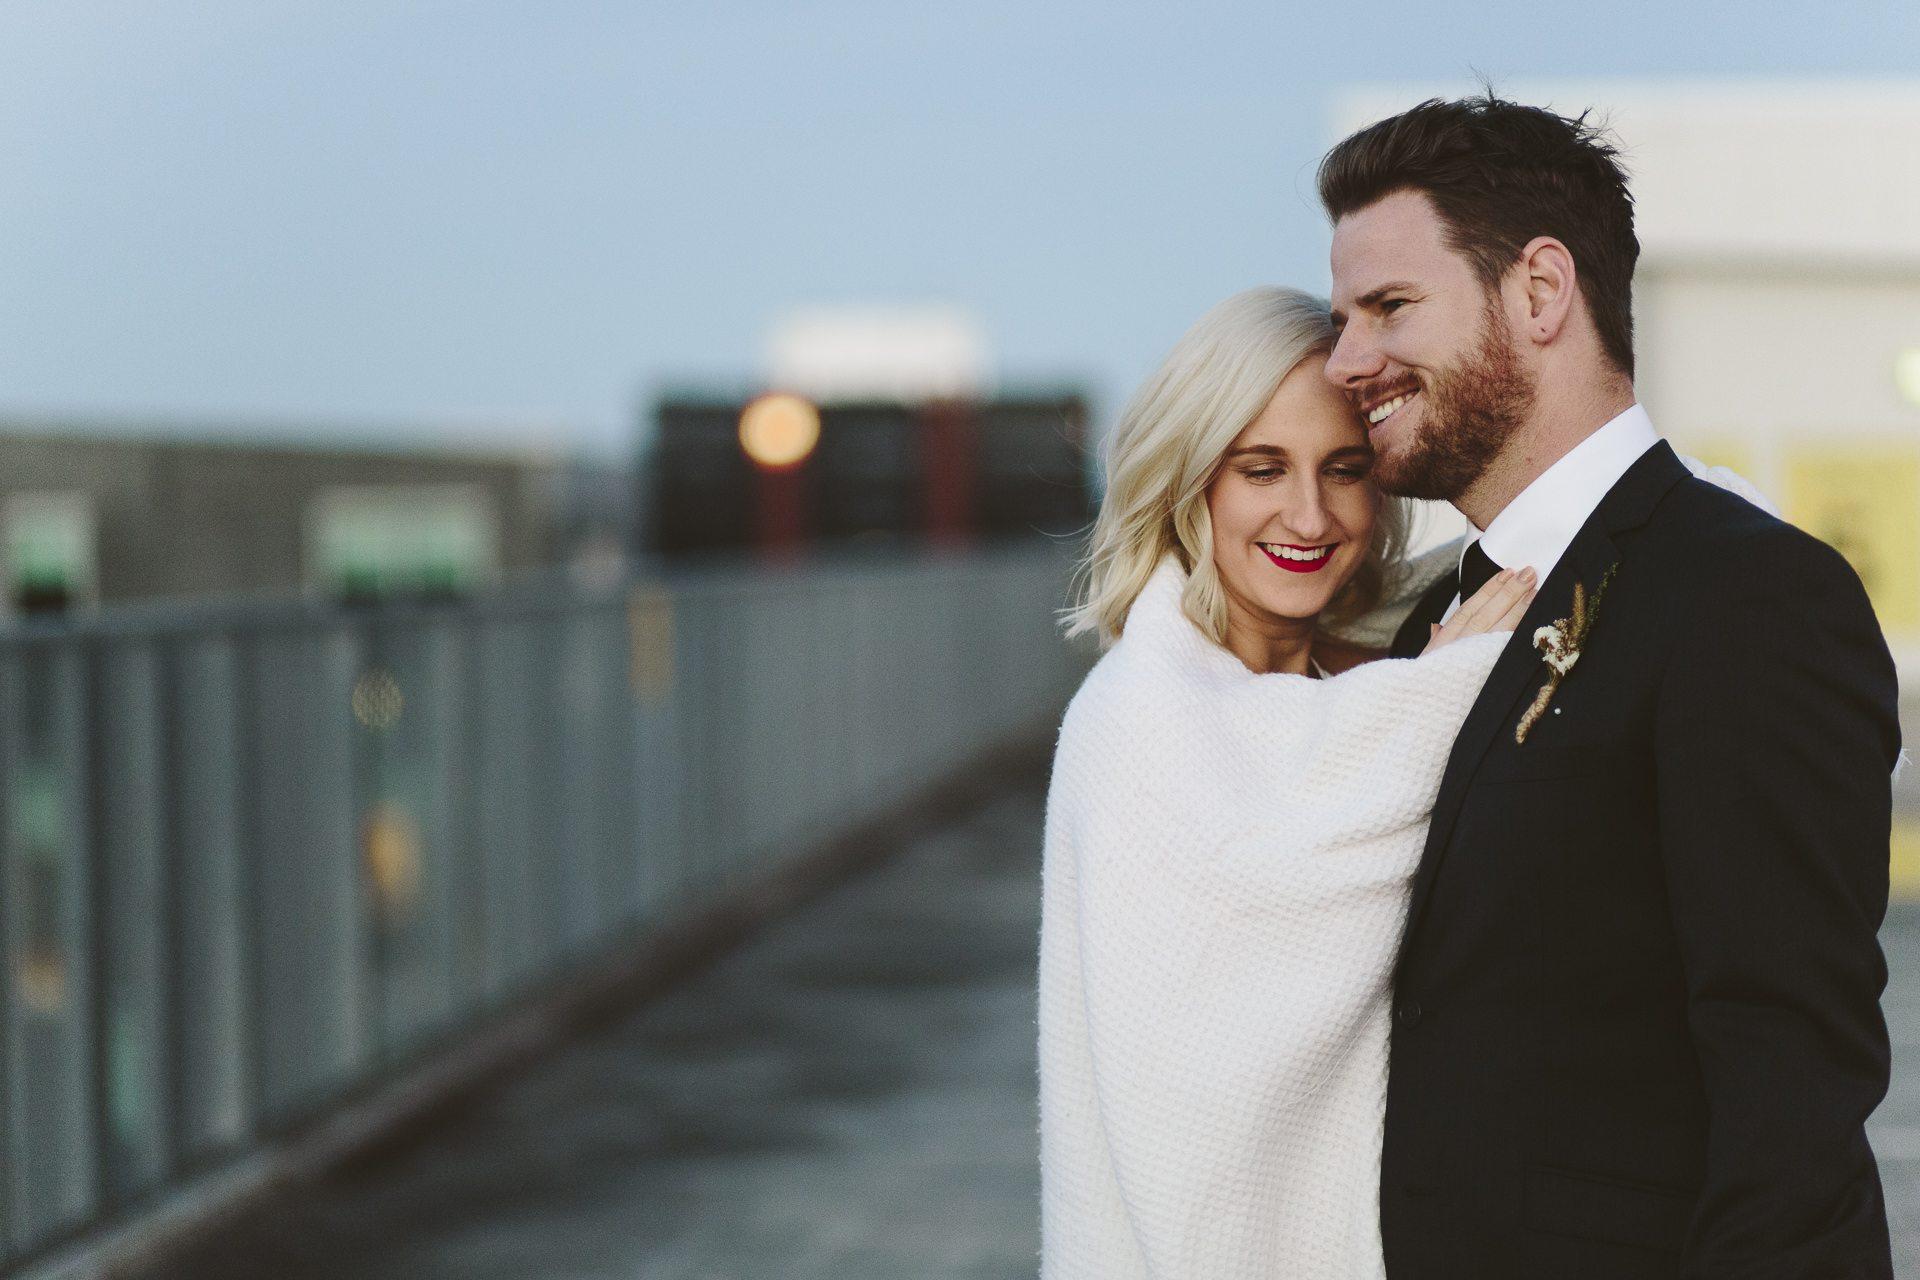 hamilton-wedding-portrait-photographer-at-130